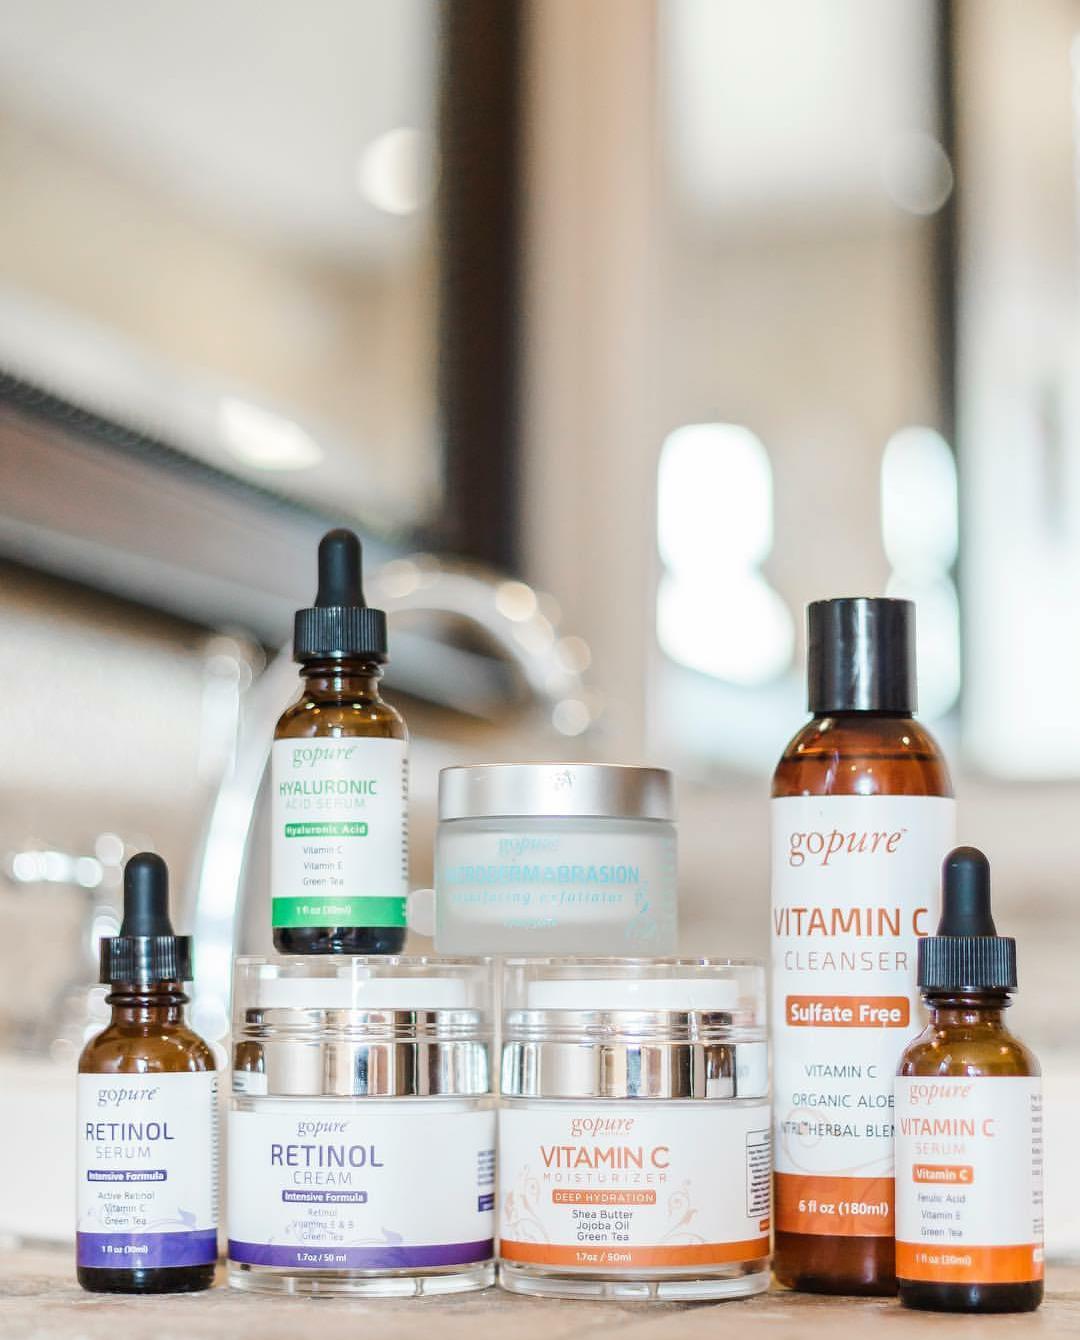 Gopure Complete Premium Skin Care System Every Step Covered 10 Items Skin Care System Skin Care Tips Skin Care